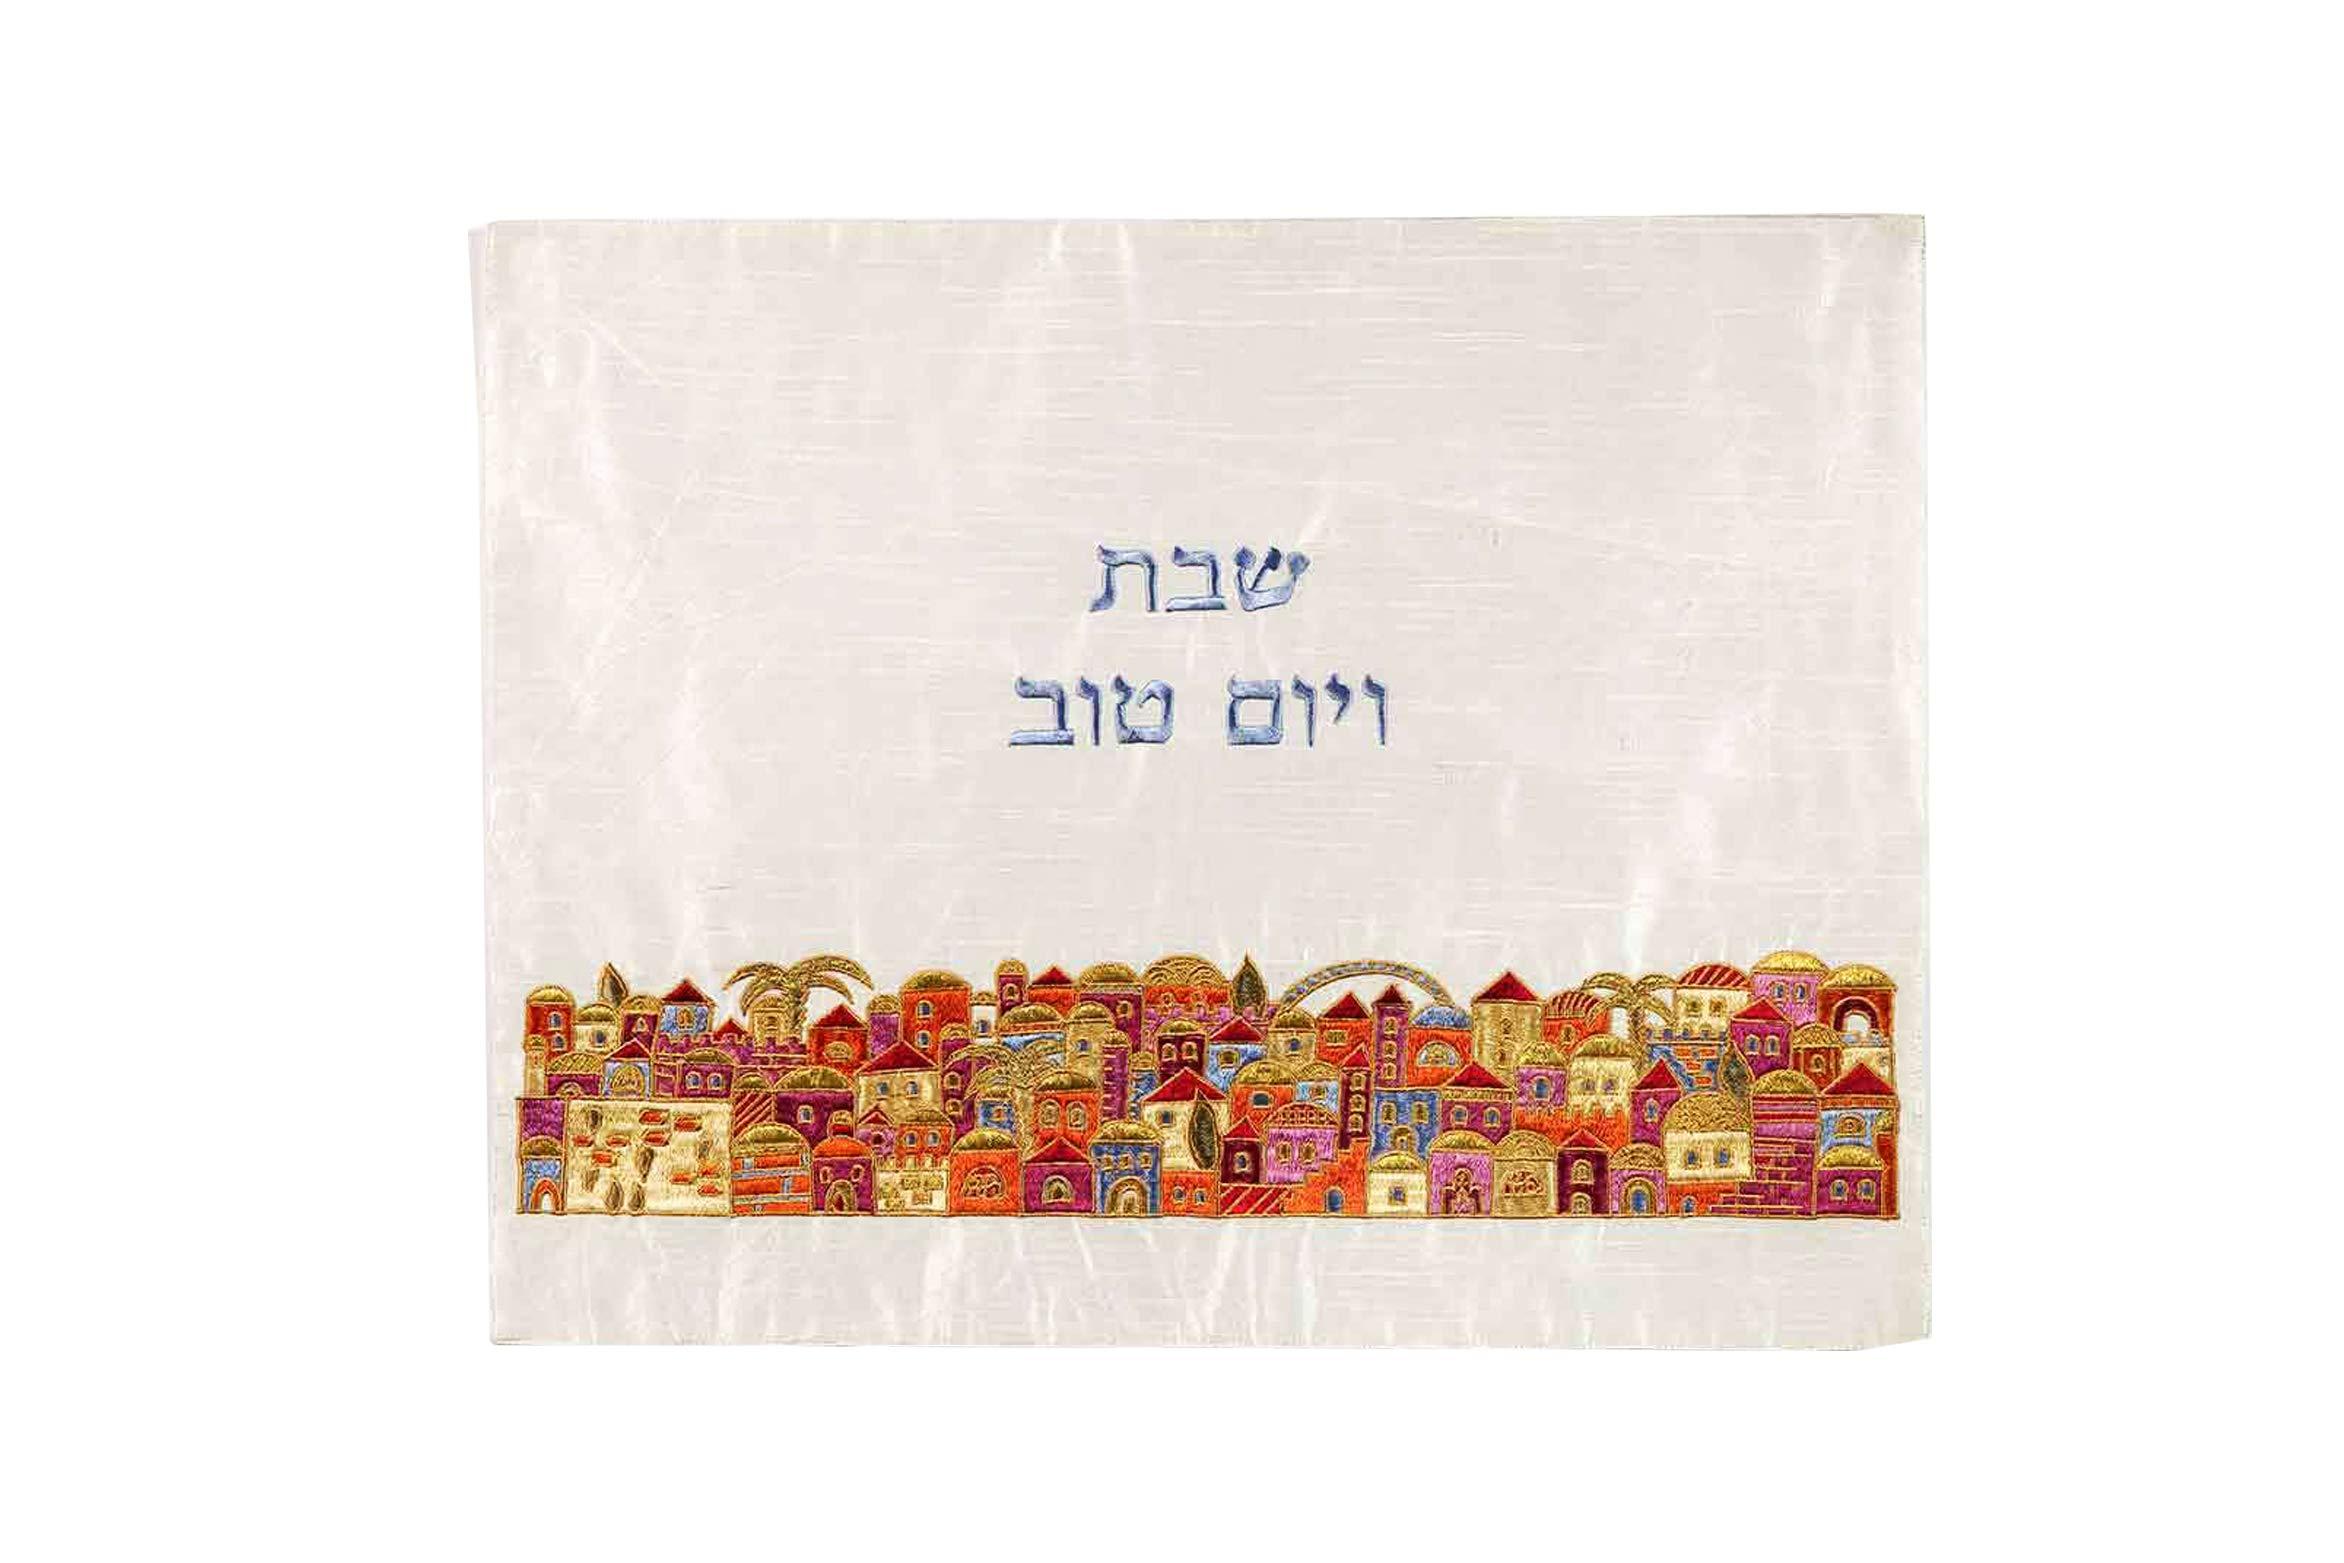 Yair Emanuel Silk Jerusalem Challah Cover & Kiddush Cup Set for Shabbat Jewish Wedding or Bar Mitzvah & Bat Mitzvah Gift. by Yair Emanuel (Image #2)